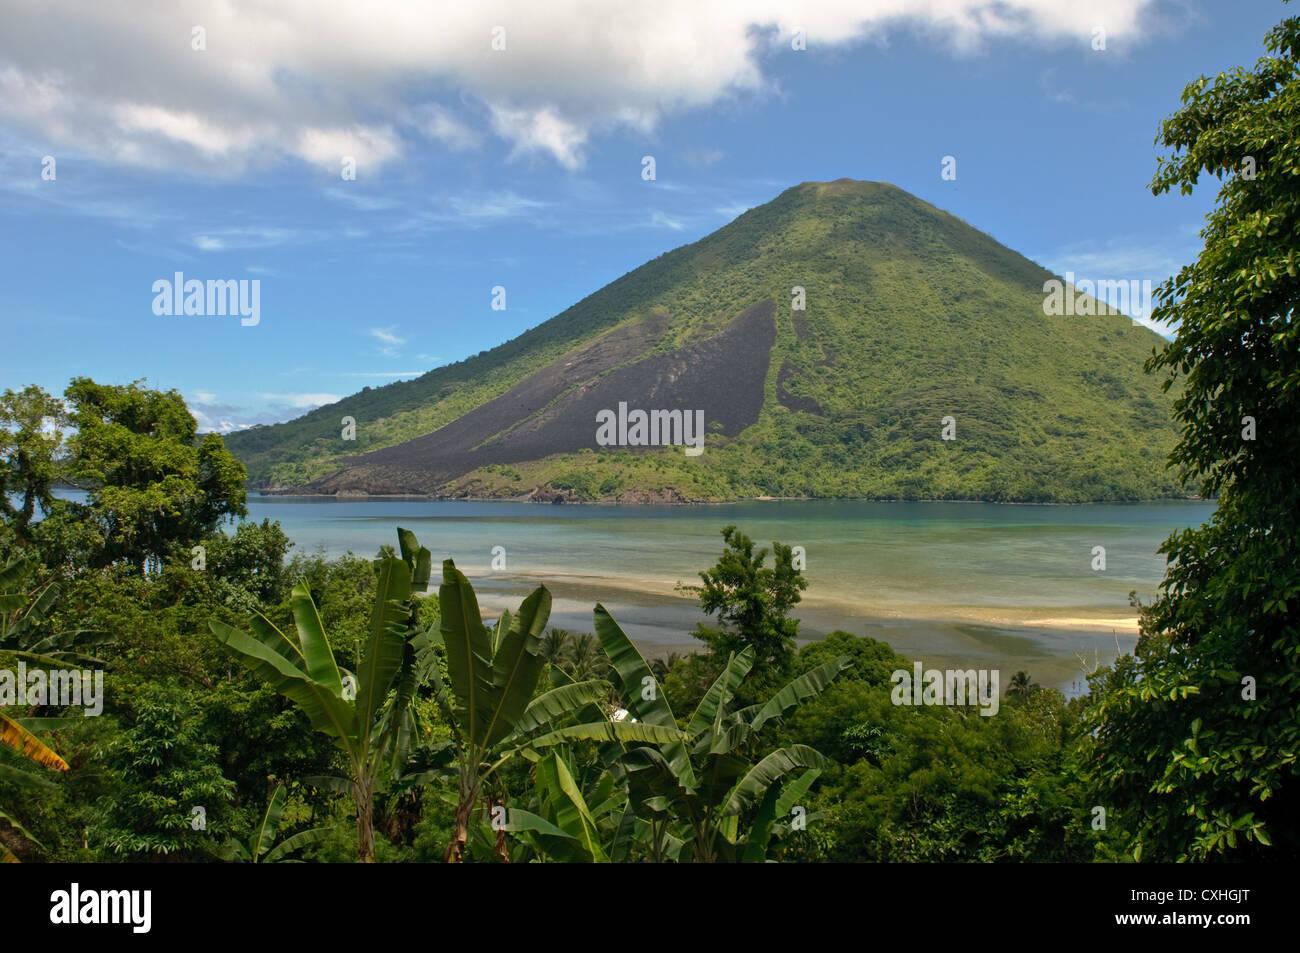 Gunung Api vulcano, Banda isole, Indonesia Immagini Stock